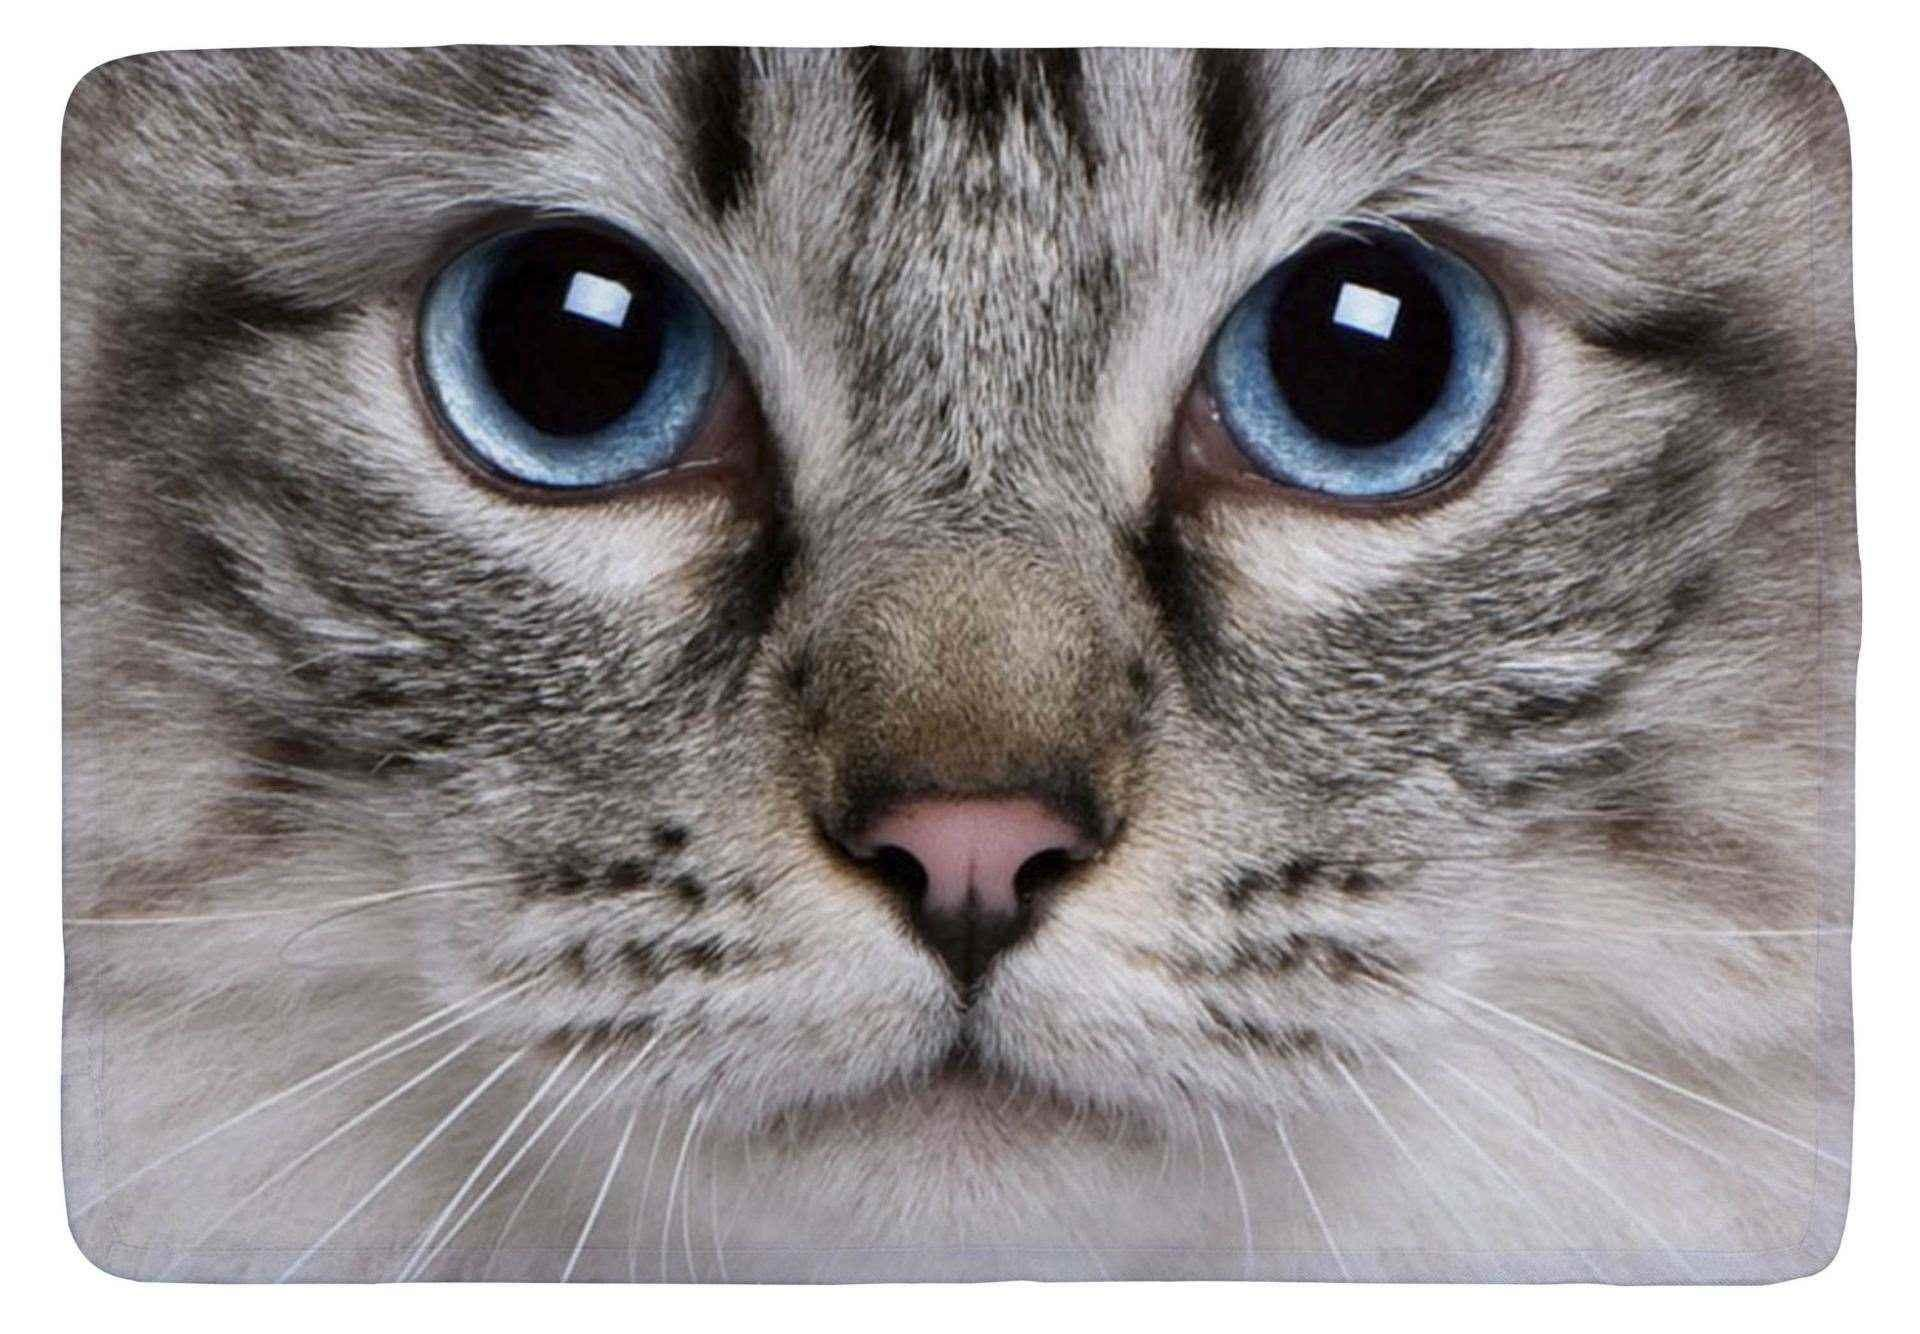 Animal Print Bedrooms Floor Mat Big Cute Cat Animal Face Print Customized Non